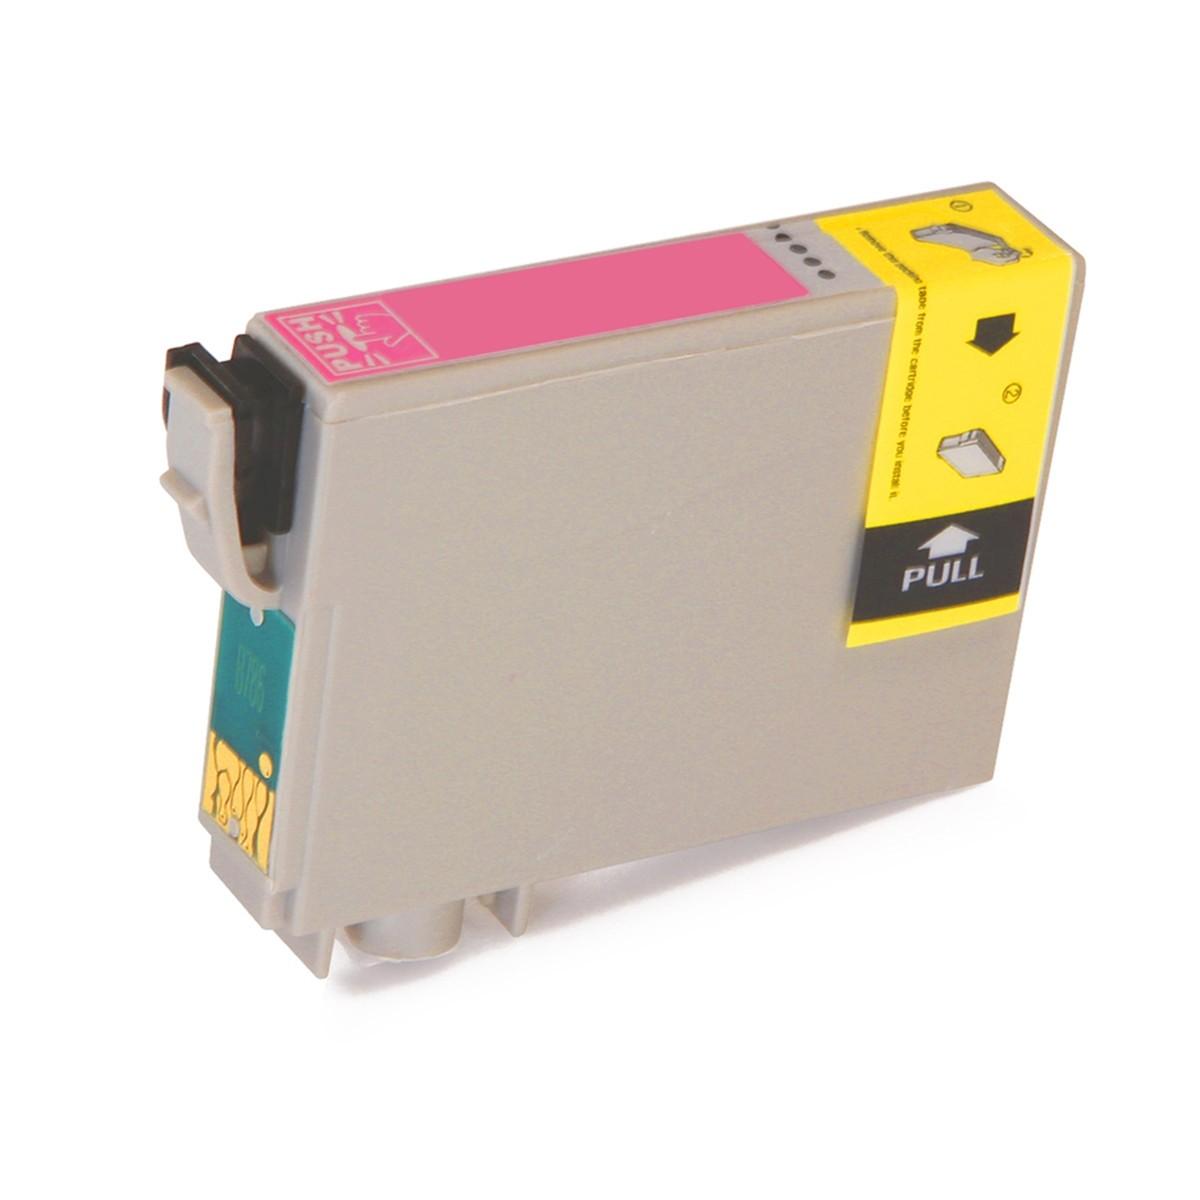 EPSON T082620 INK / INKJET Cartridge Light Magenta High Yield